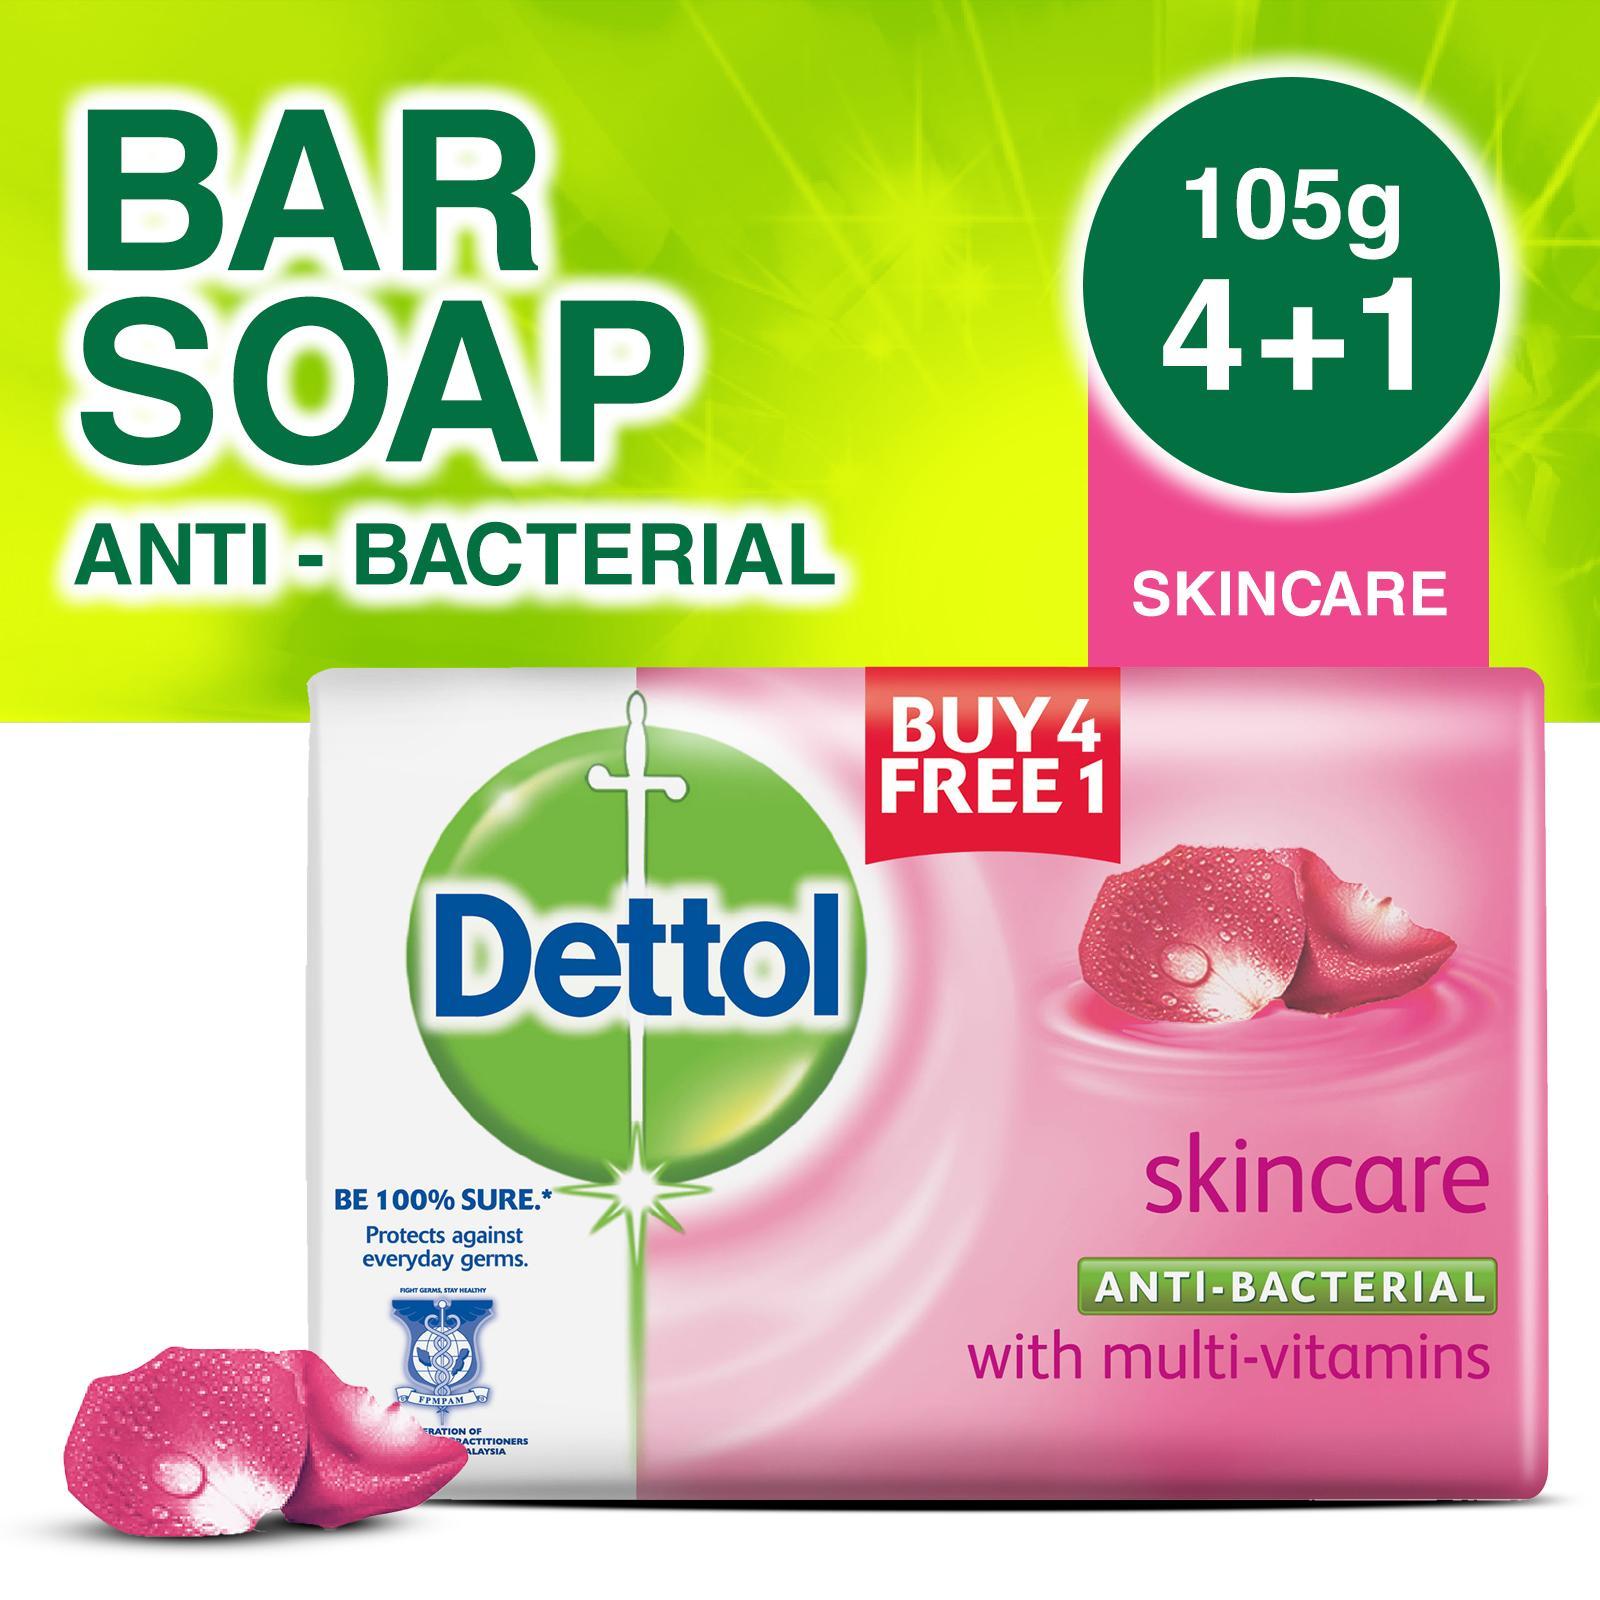 4+1 free Dettol Anti-Bacterial Bar Soap Skincare 105G